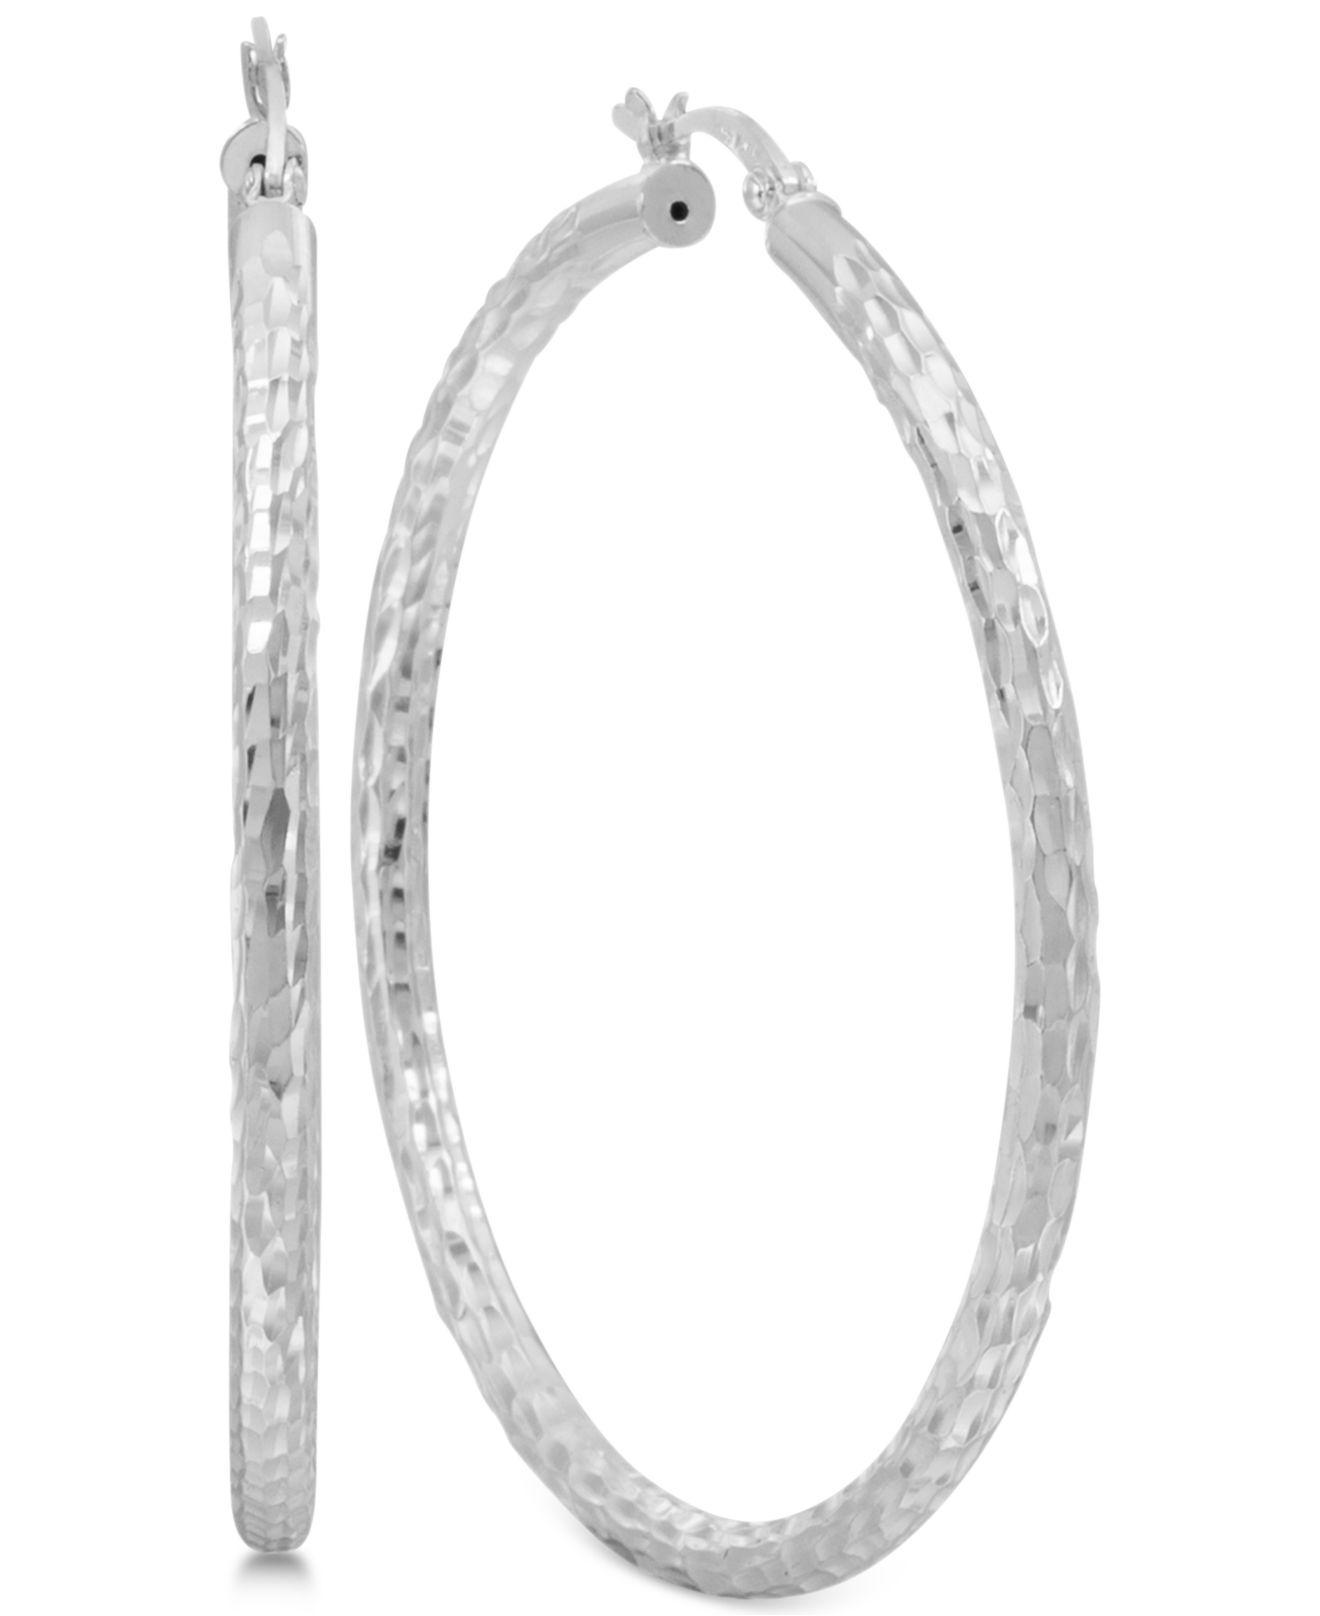 02cce55f1 Lyst - Macy's Thin Textured Hoop Earrings In Sterling Silver in Metallic